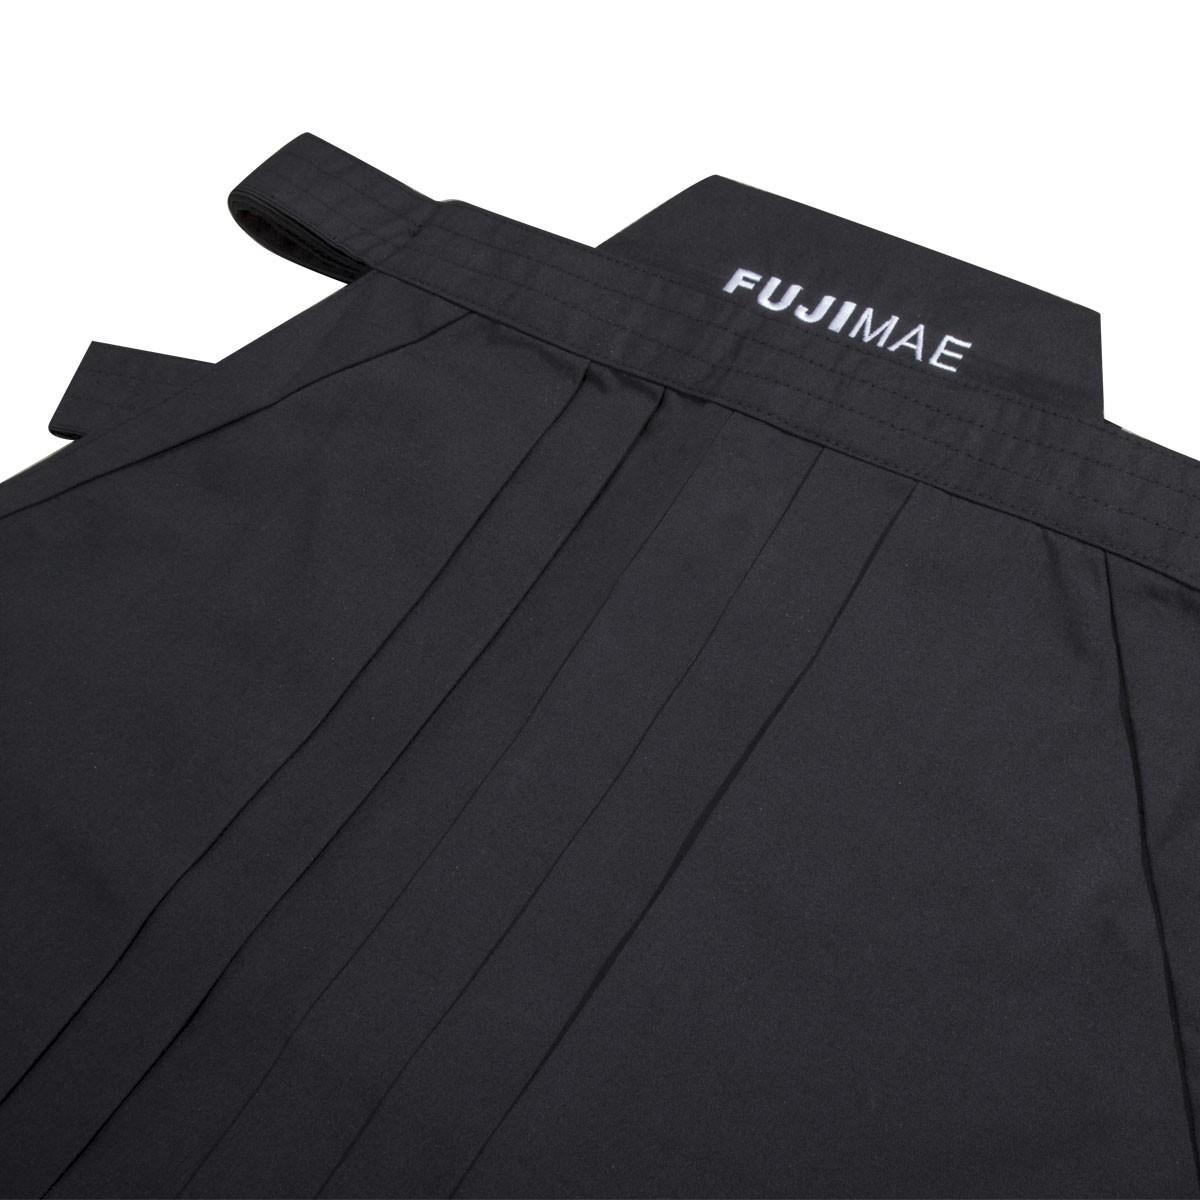 Fuji Mae Hakama Noir